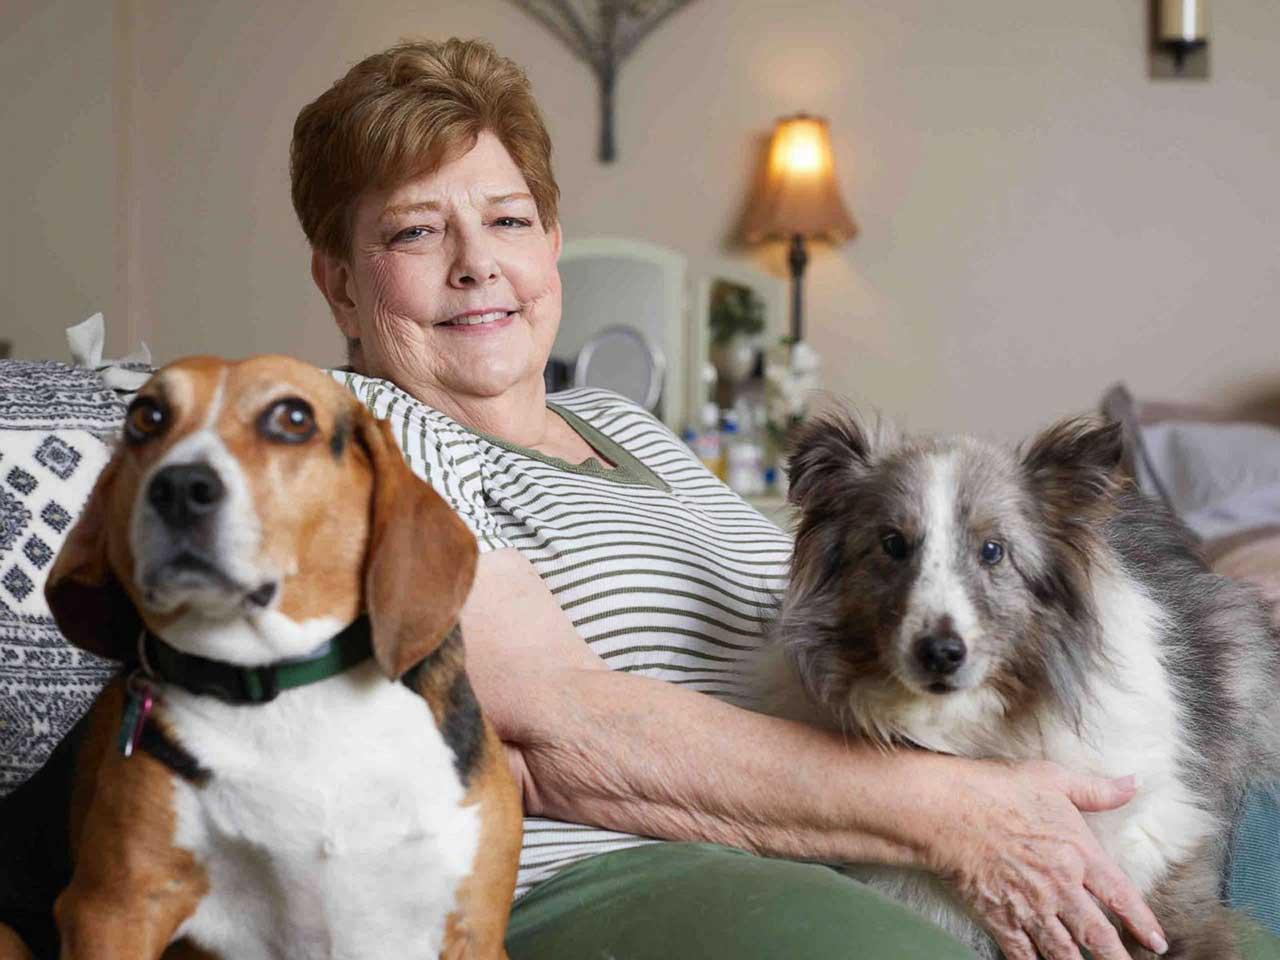 Lynn Schutzman car dogs Ex-pharmacist Homeless woman